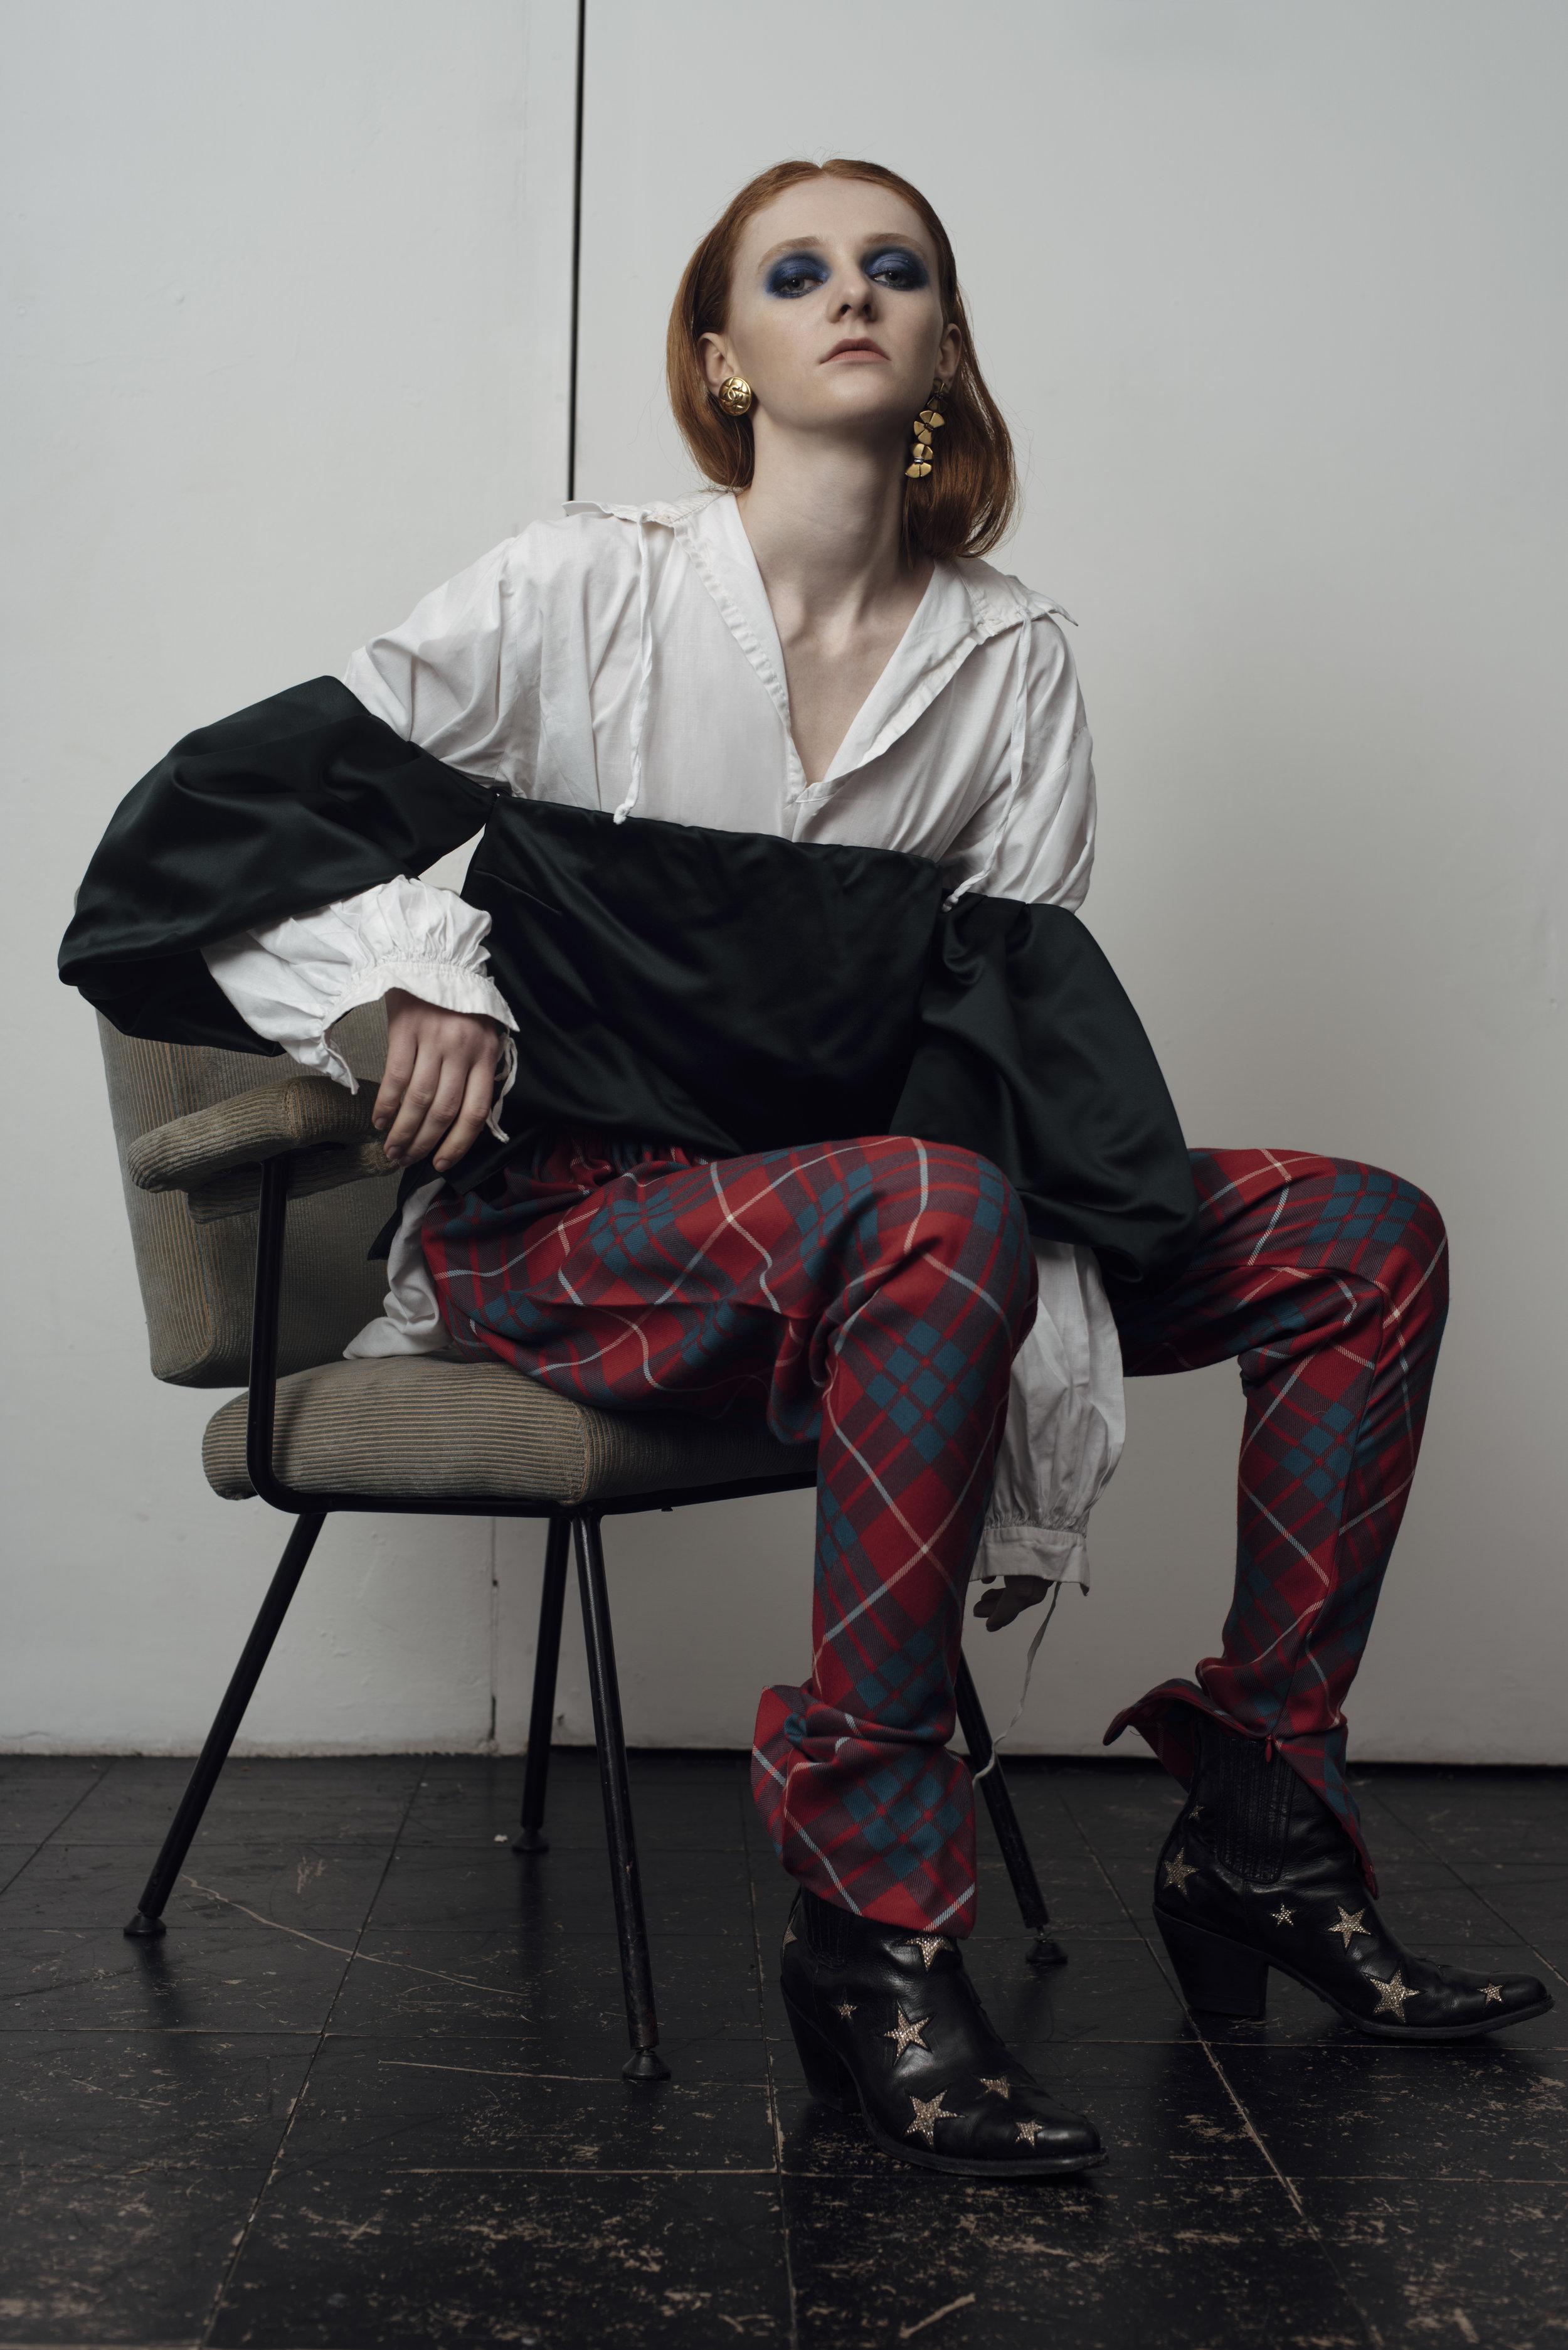 shirt COSTUME STUDIO, trousers  BAREIA AHMAD ,Star cowboy moots MEXICANA Earrings STYLIST'S OWN